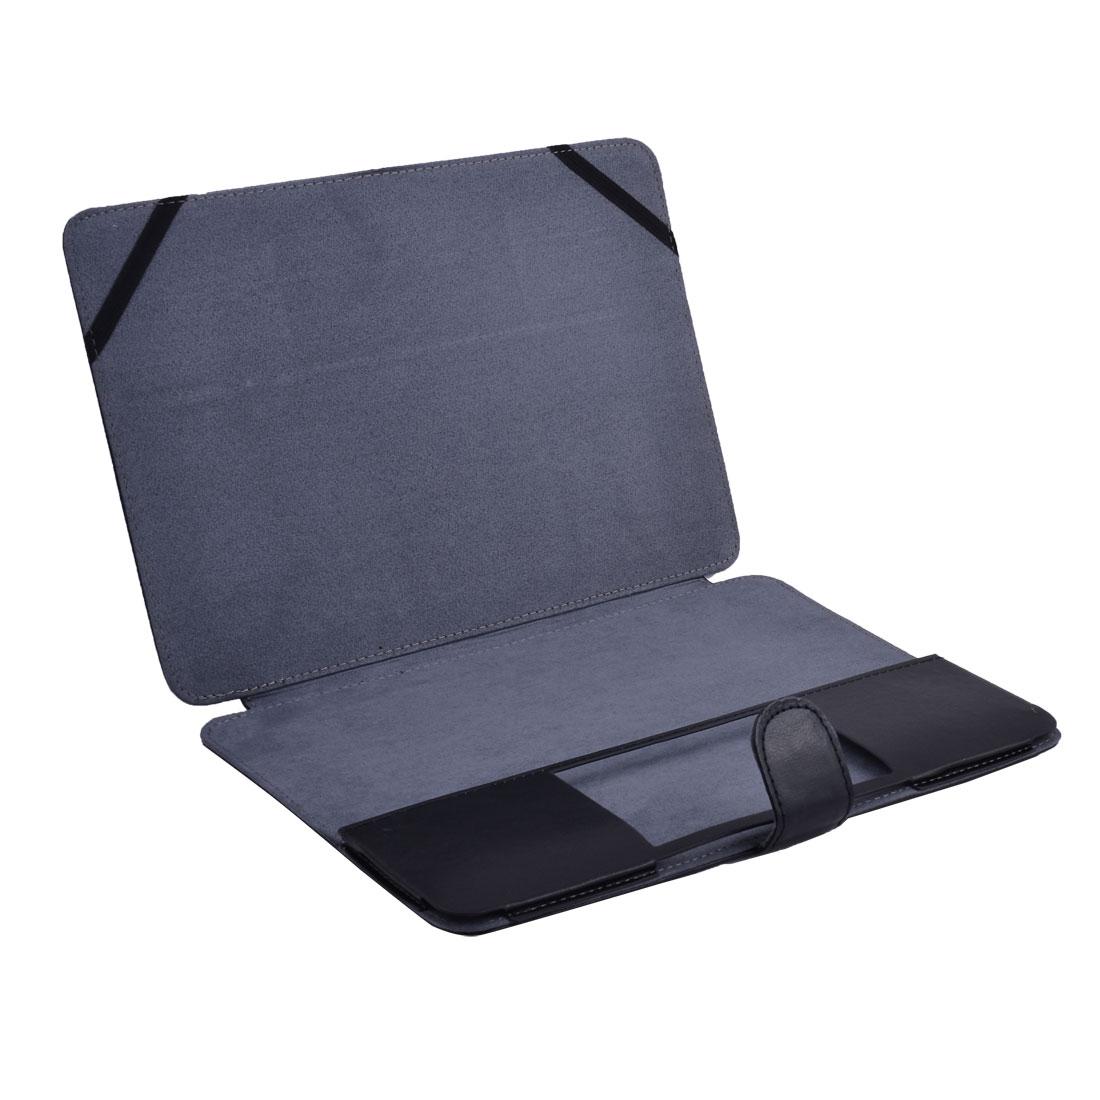 PC PU Leather Clip On Case Bag Book Cover Black for Macbook Retina 12 Inch